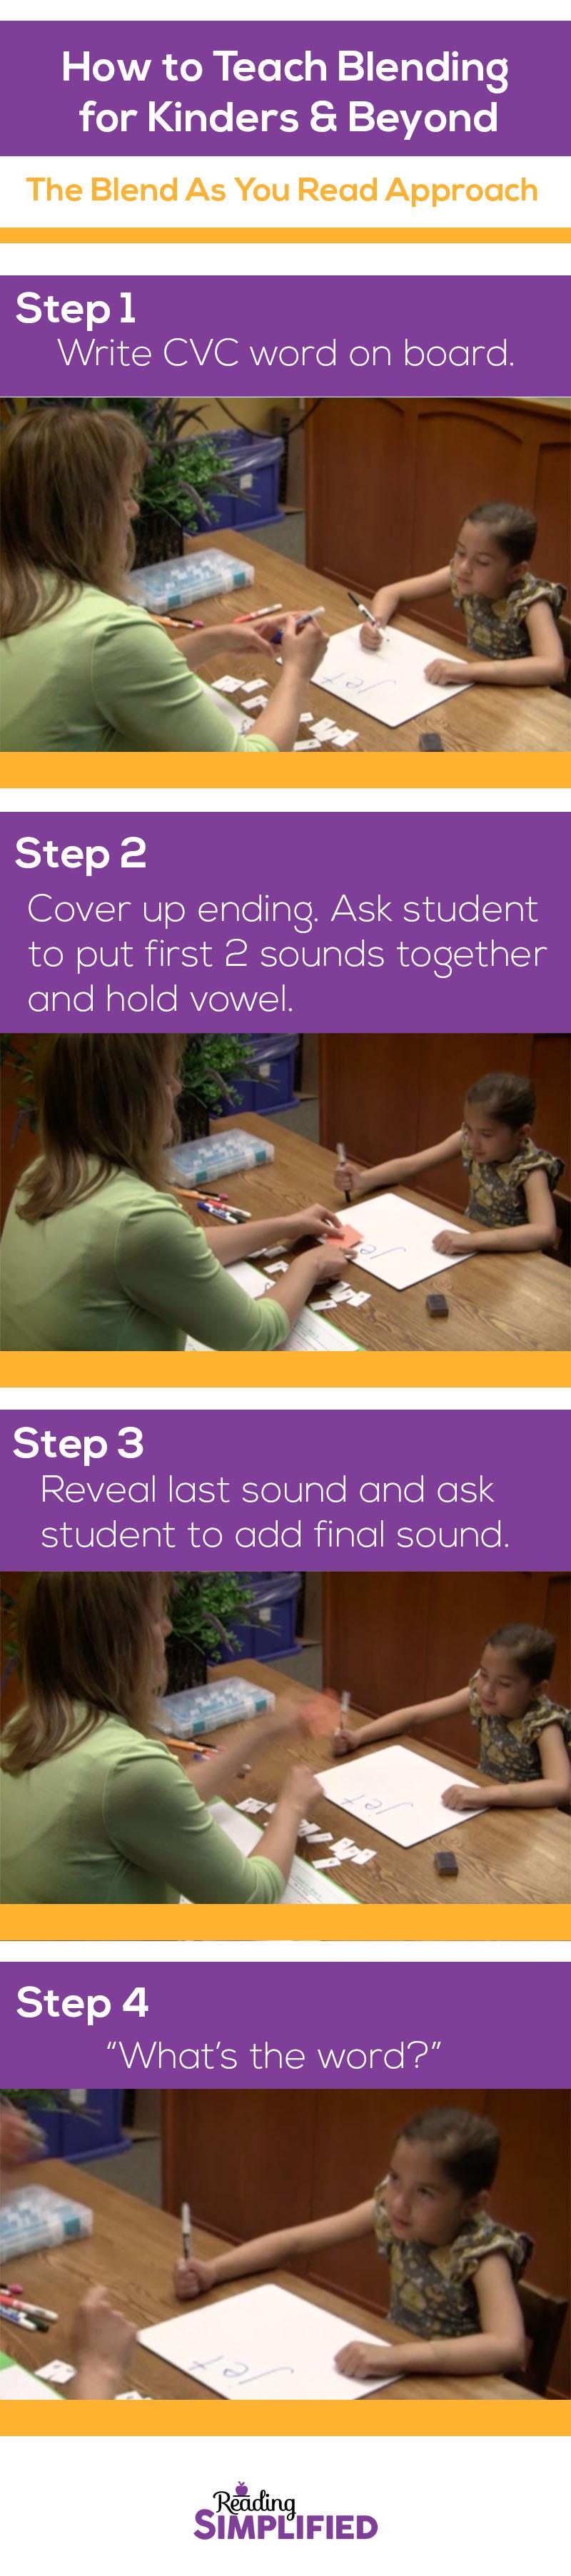 steps for blending sounds in words